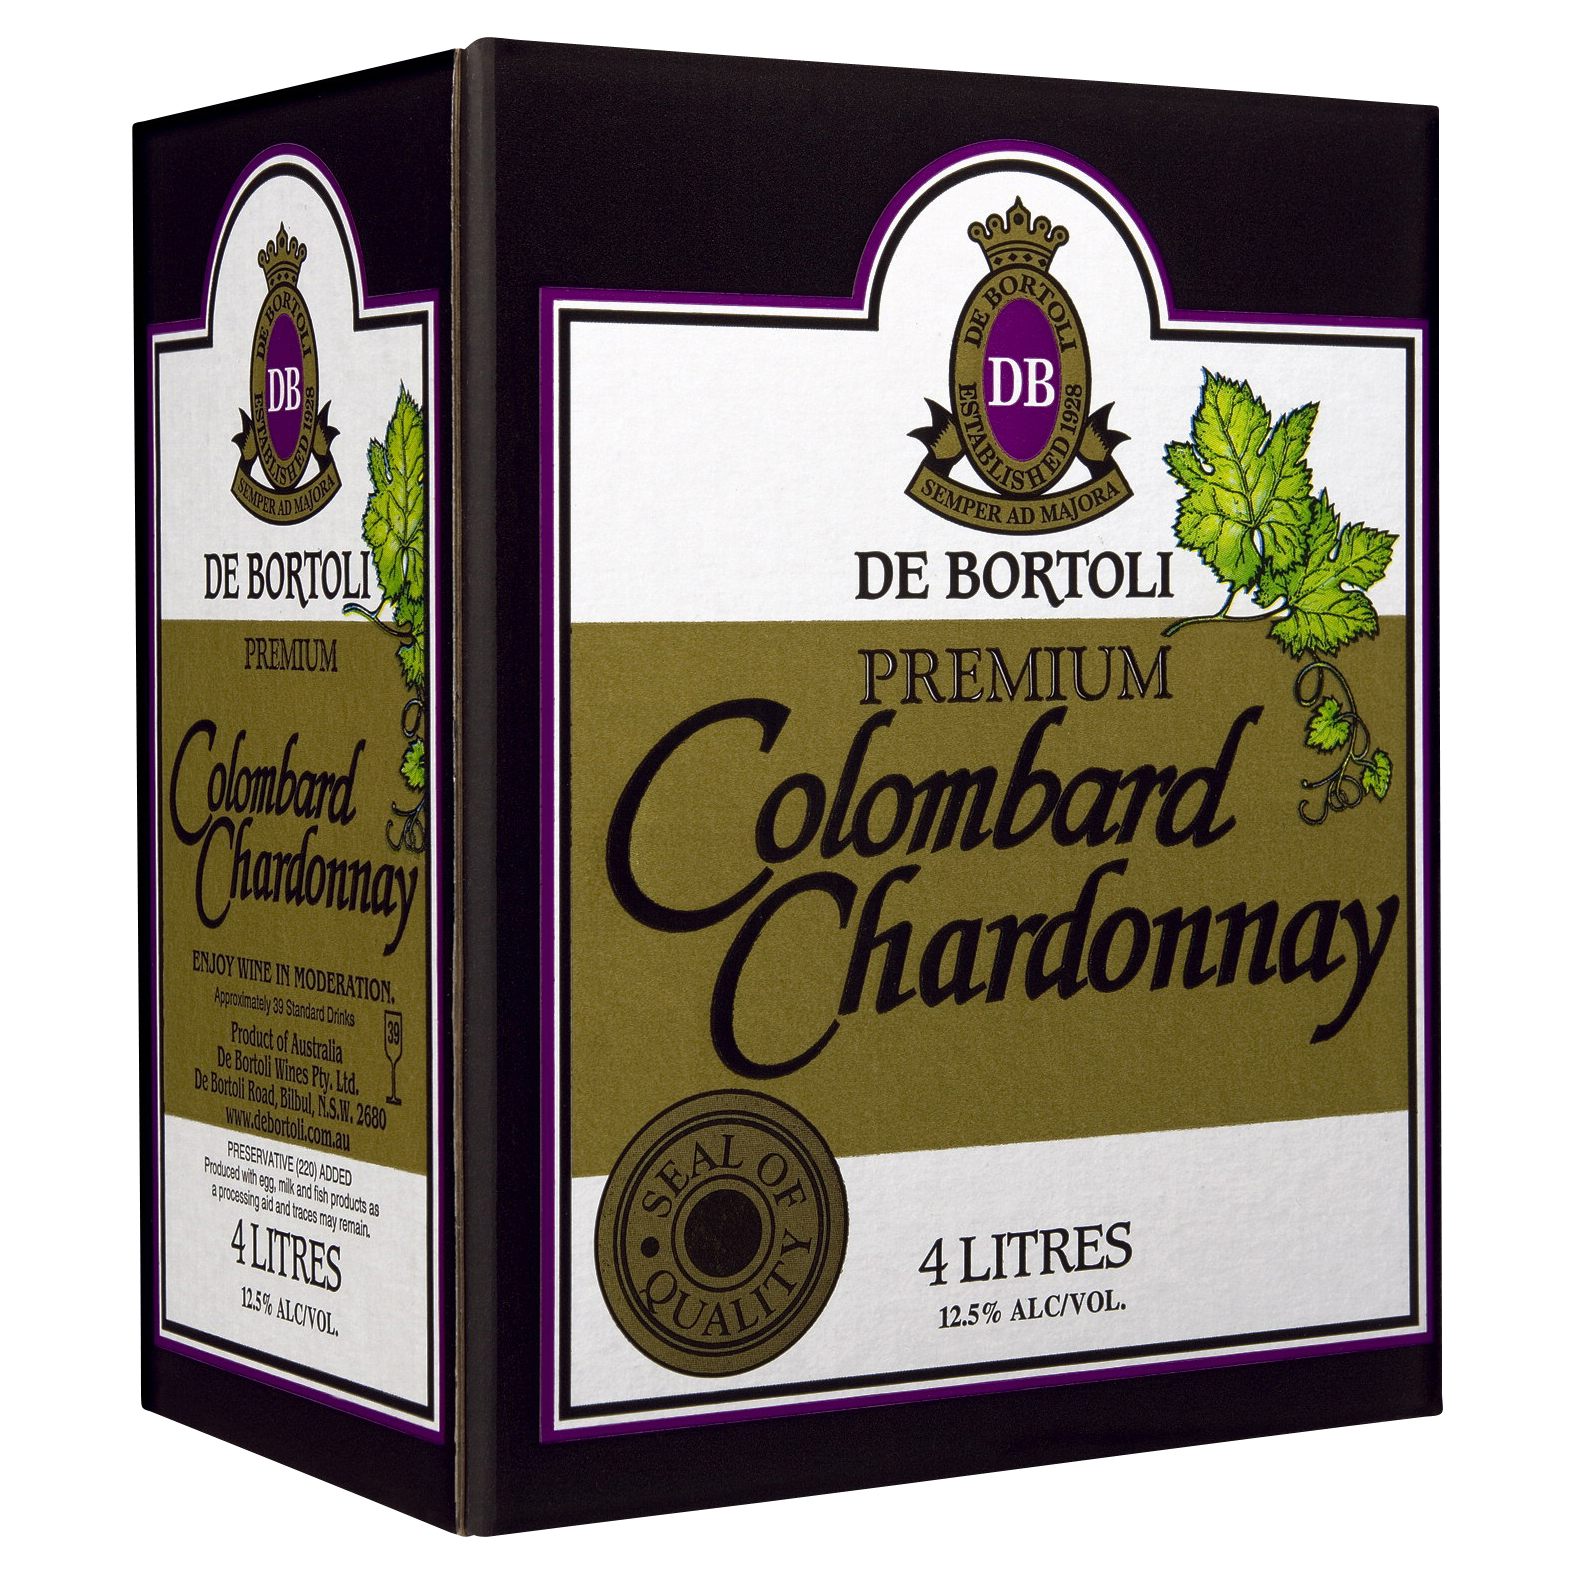 DE BORTOLI PREMIUM COLOMBARD CHARDONNAY